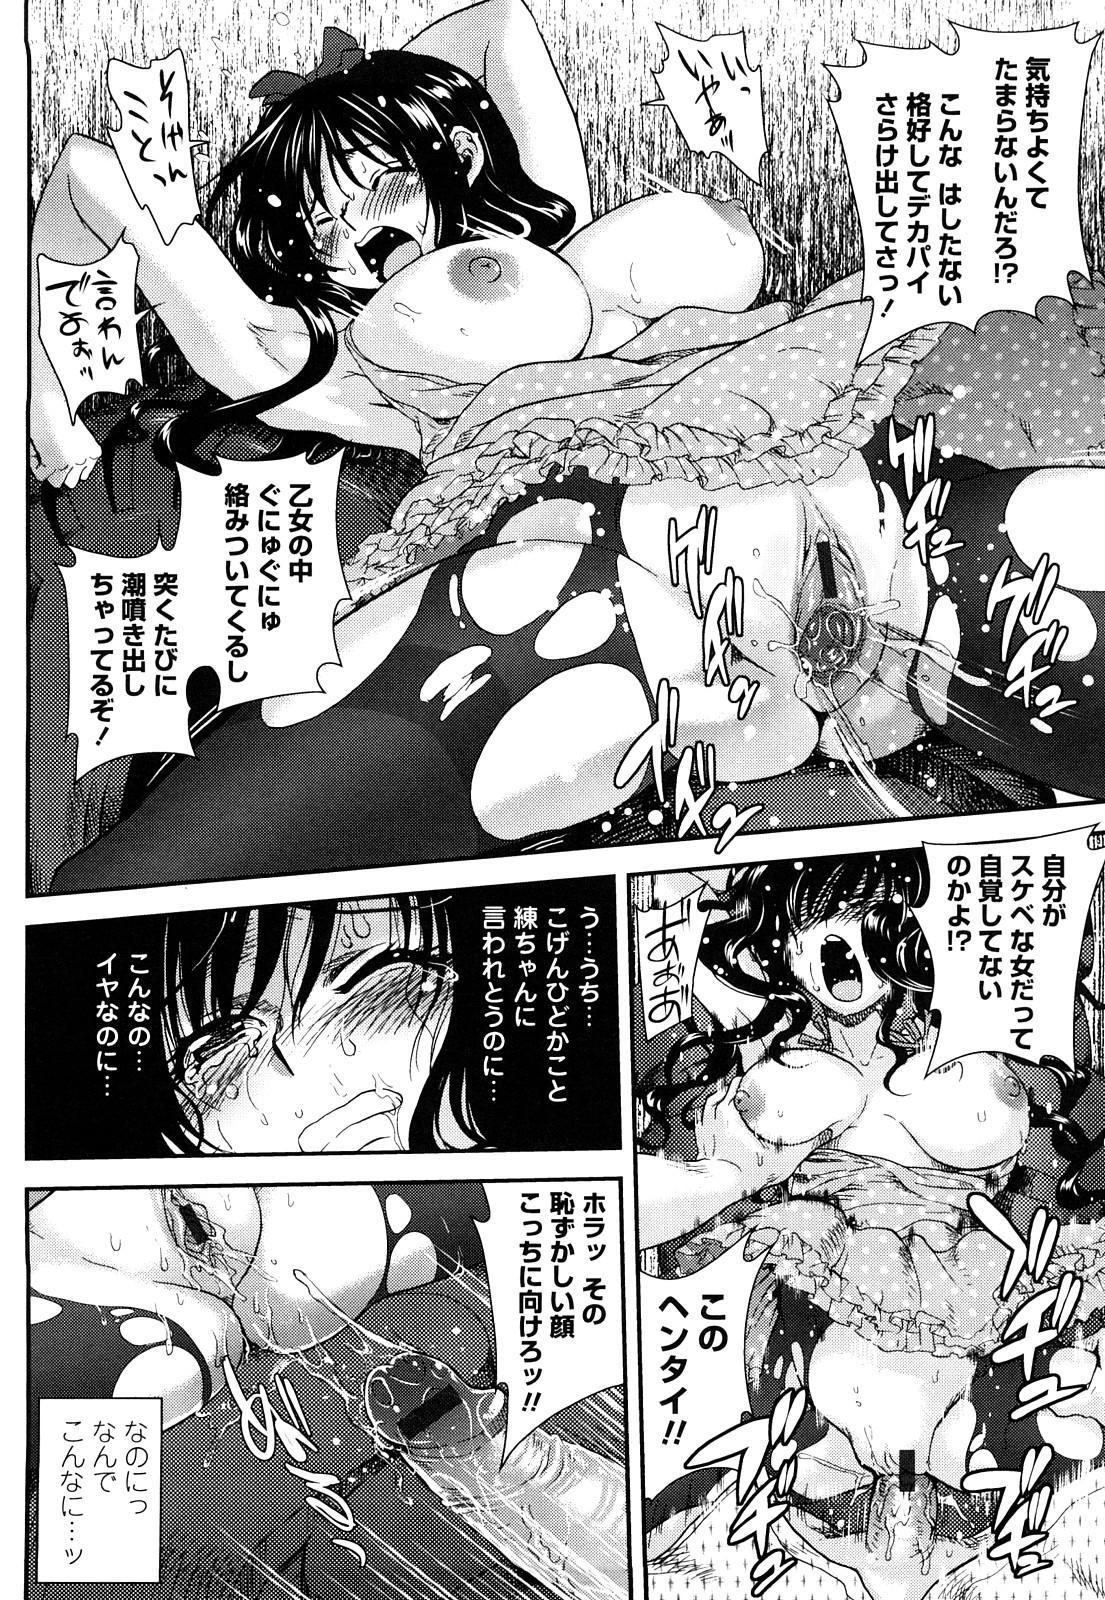 Ichigo Marble 82